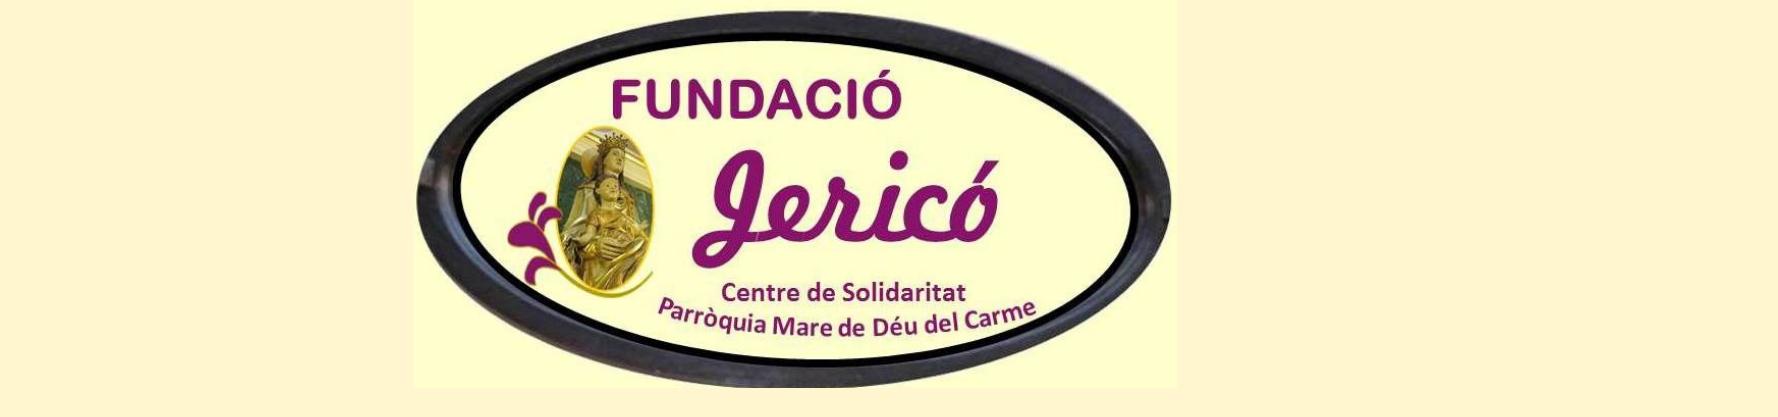 public://Banners/jerico11.png